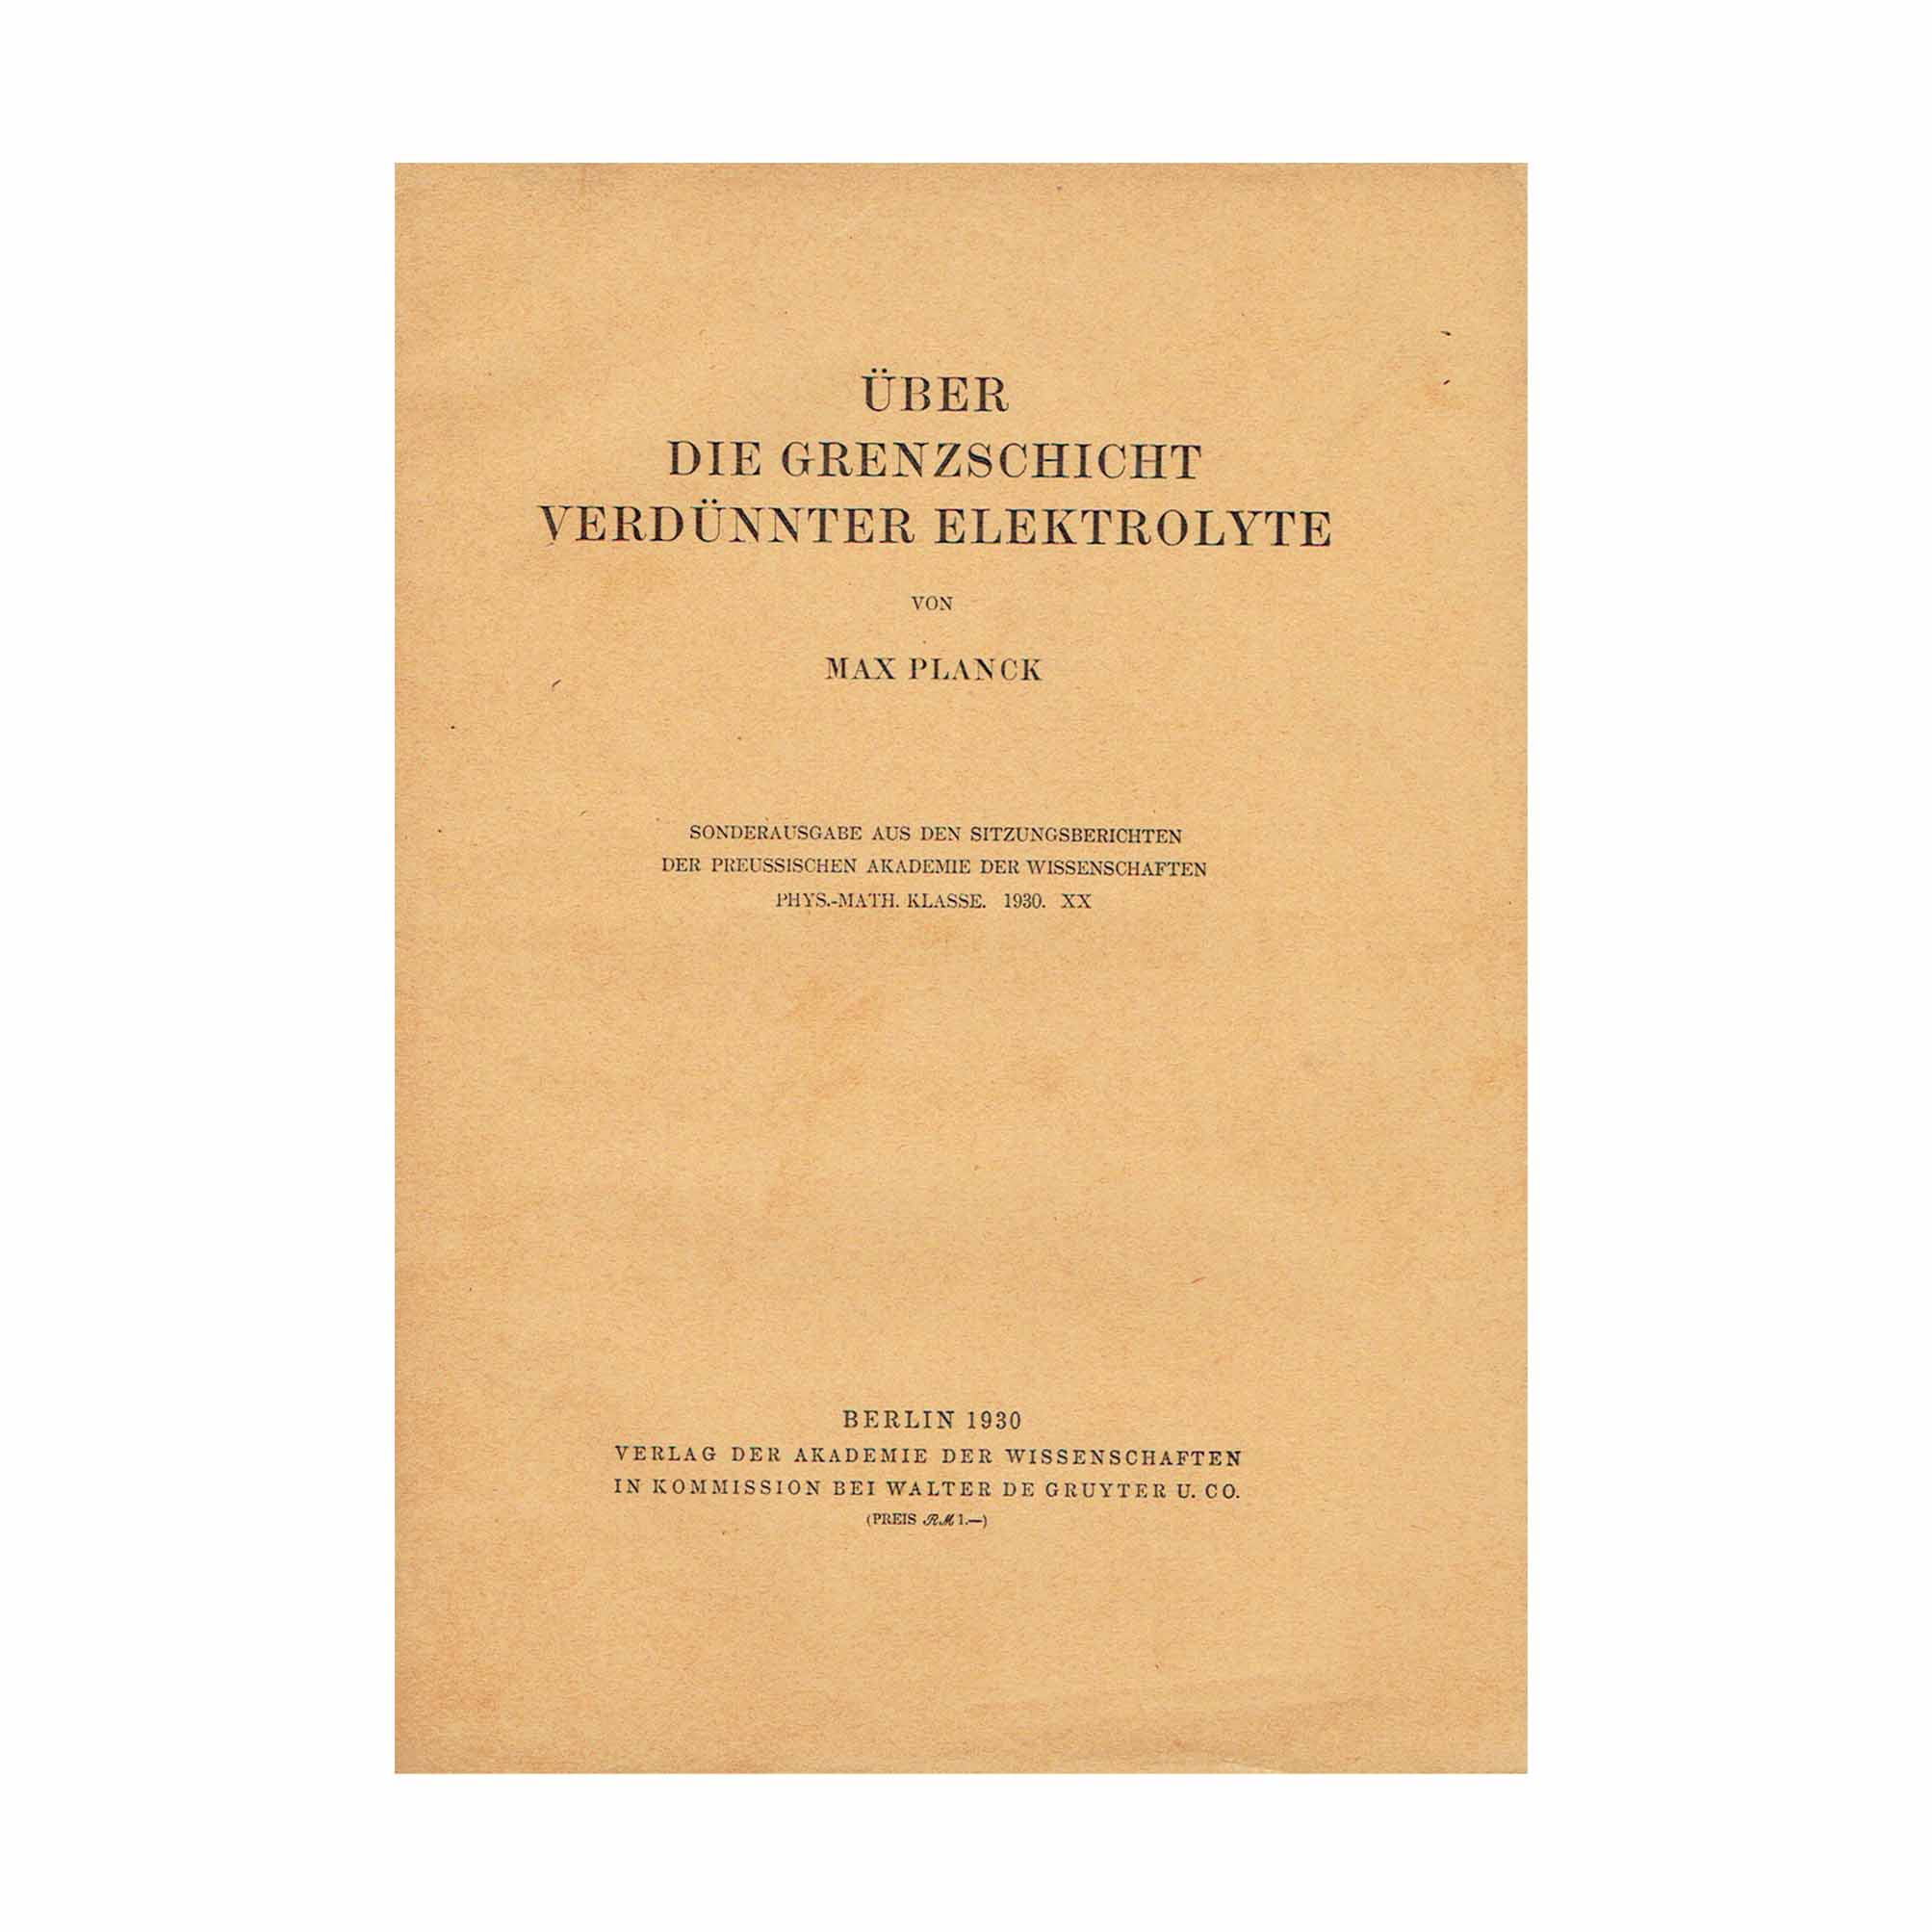 5824K-Planck-Grenzschicht-Elektrolyte-1930-1-Front-Cover-N.jpeg